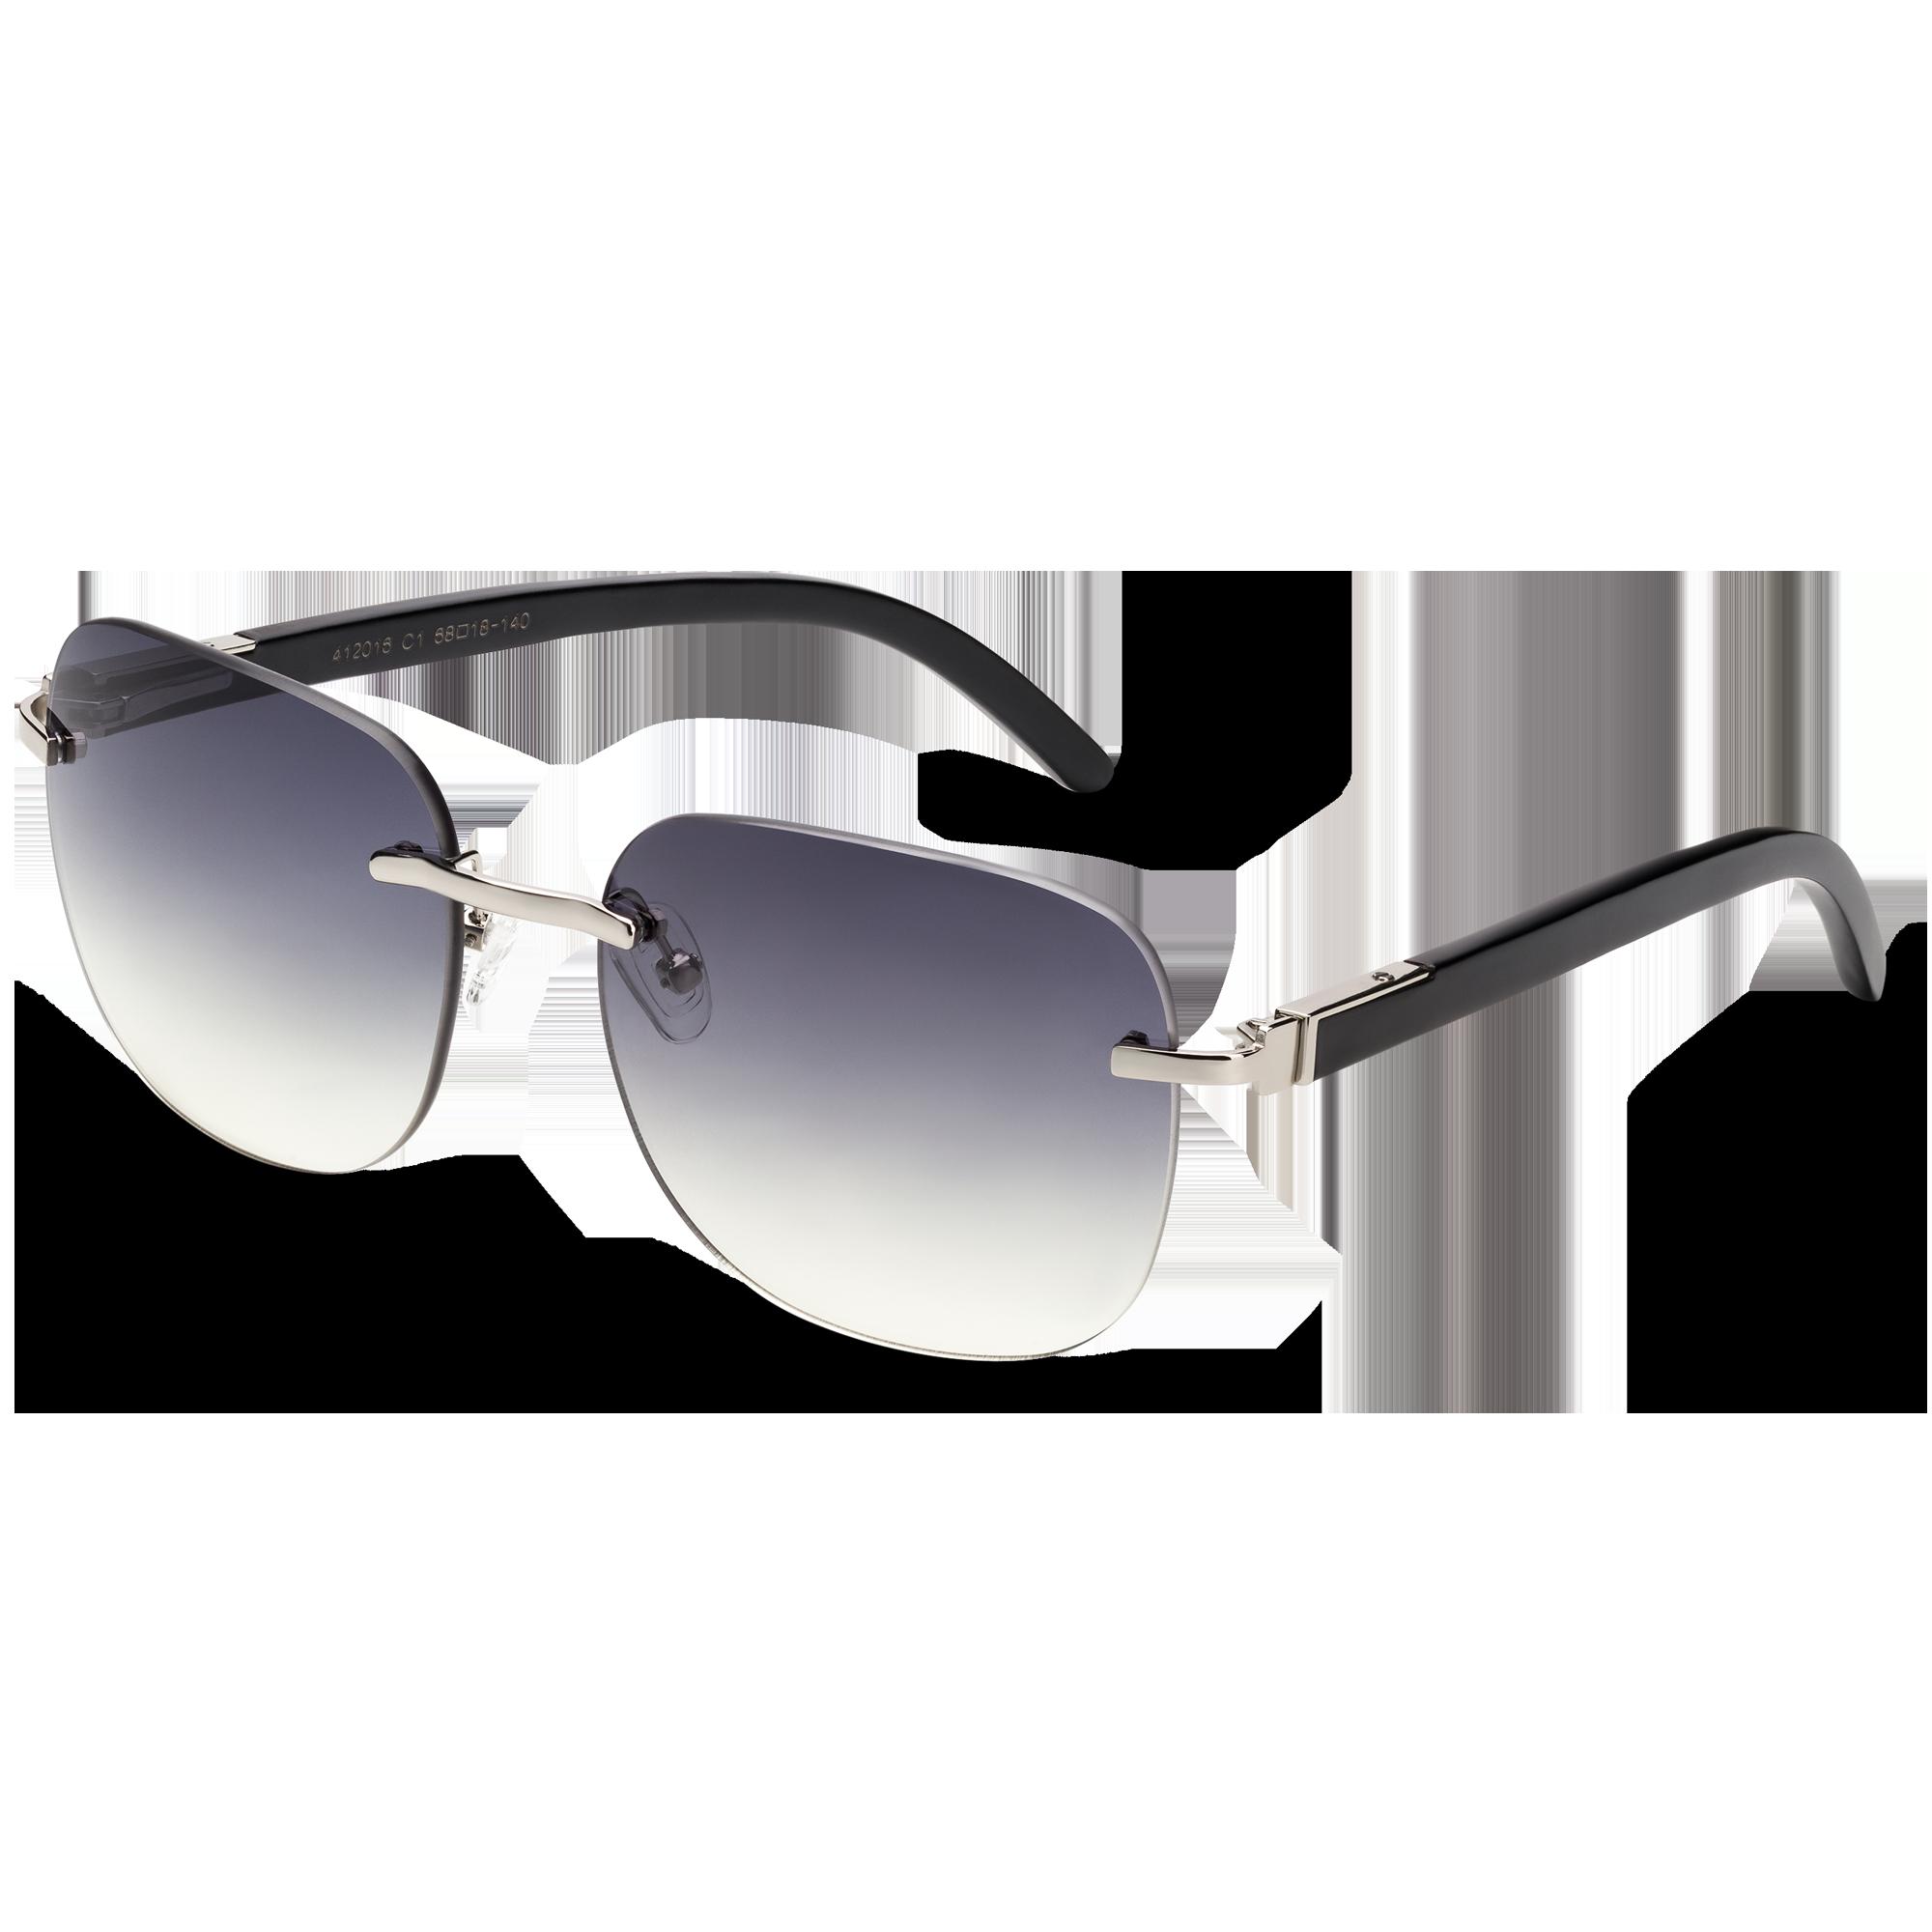 black sunglasses product image